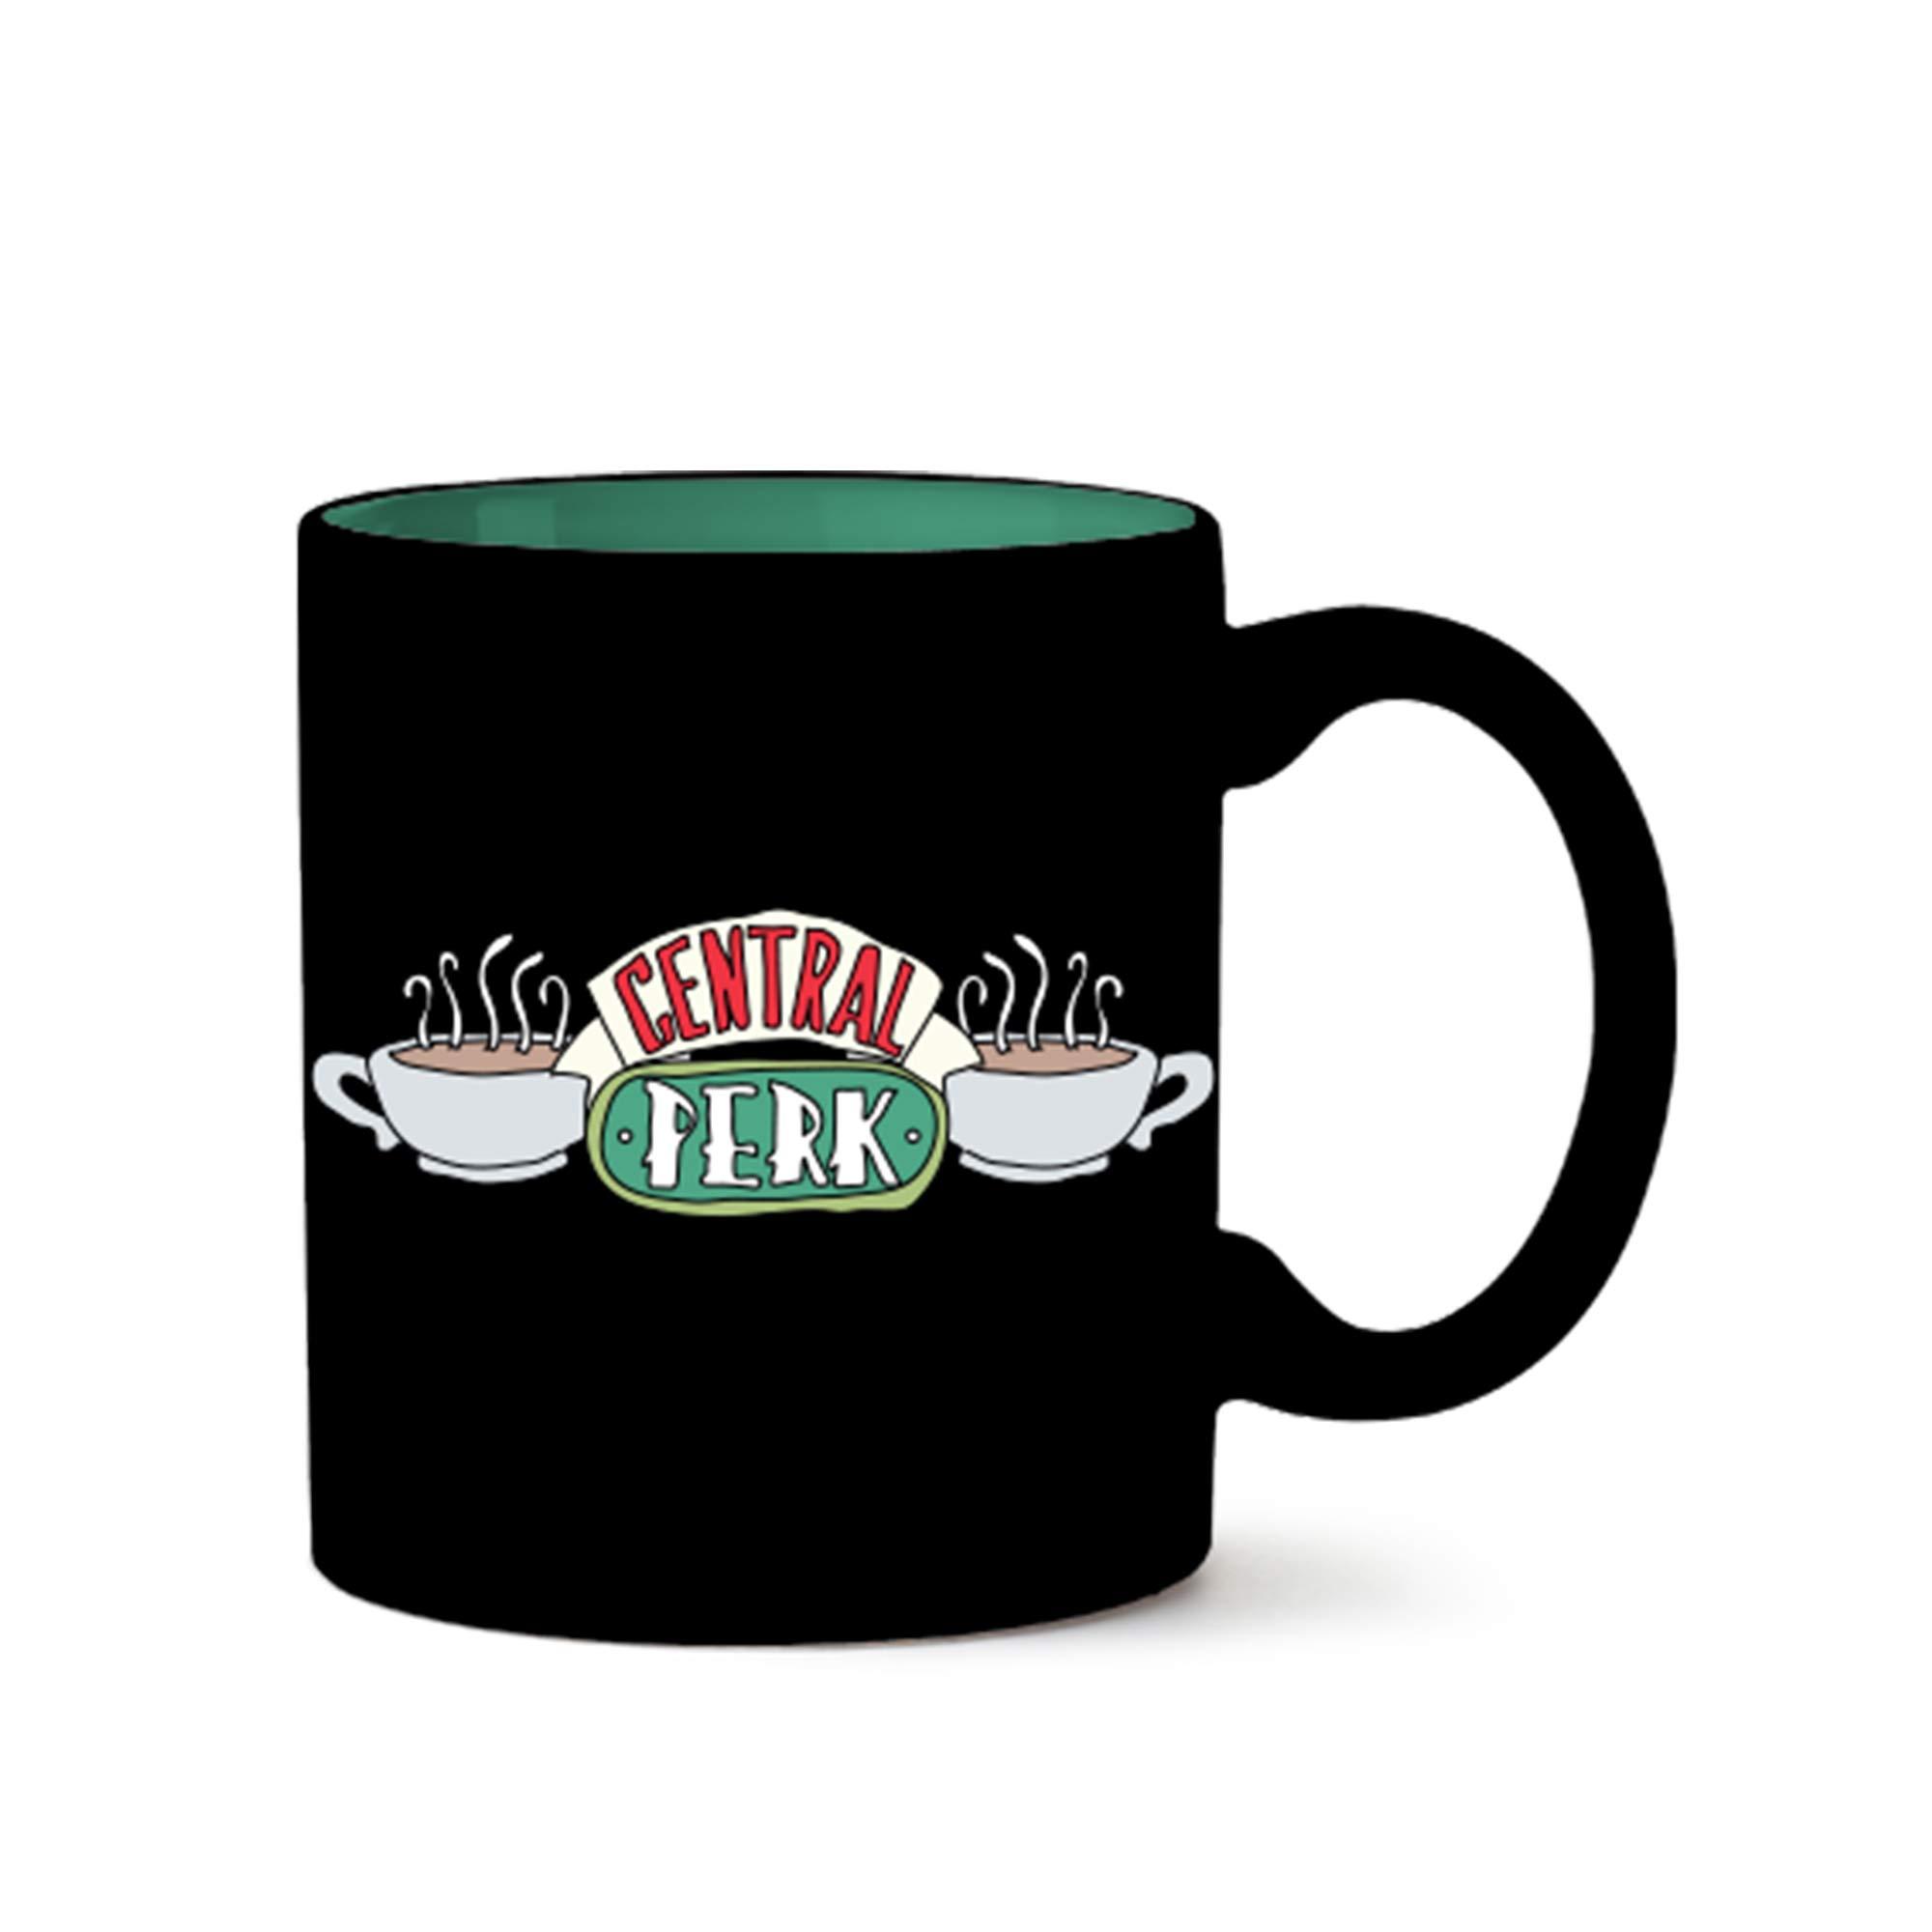 ویکالا · خرید  اصل اورجینال · خرید از آمازون · Silver Buffalo FRD31032 Friends Central Perk Doodle Logo Ceramic Mug, 14-Ounce, Black wekala · ویکالا